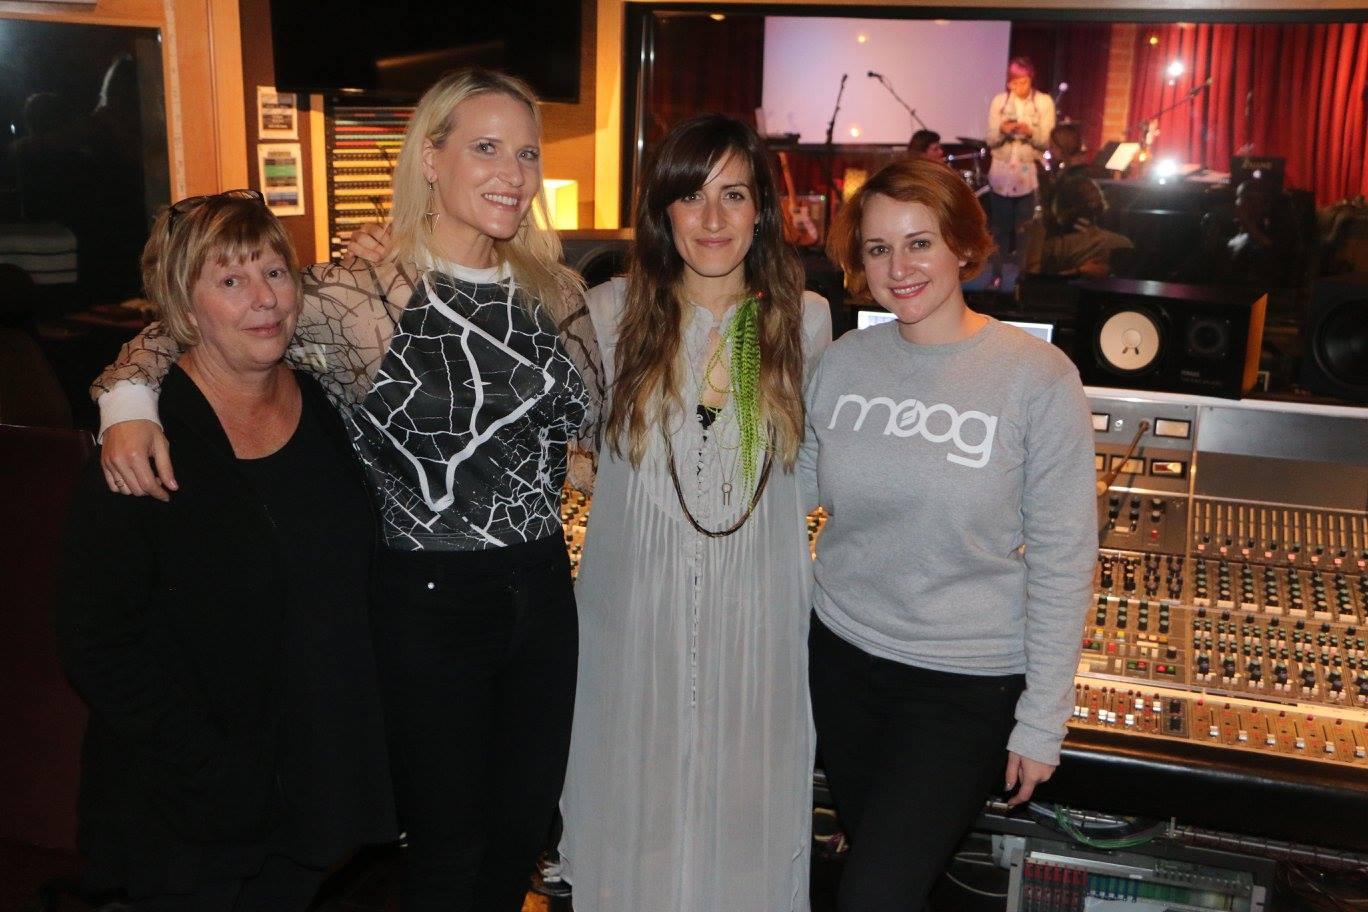 Karrie Keyes, Laura Alluxe Escudé, RYAT & Erin Barra